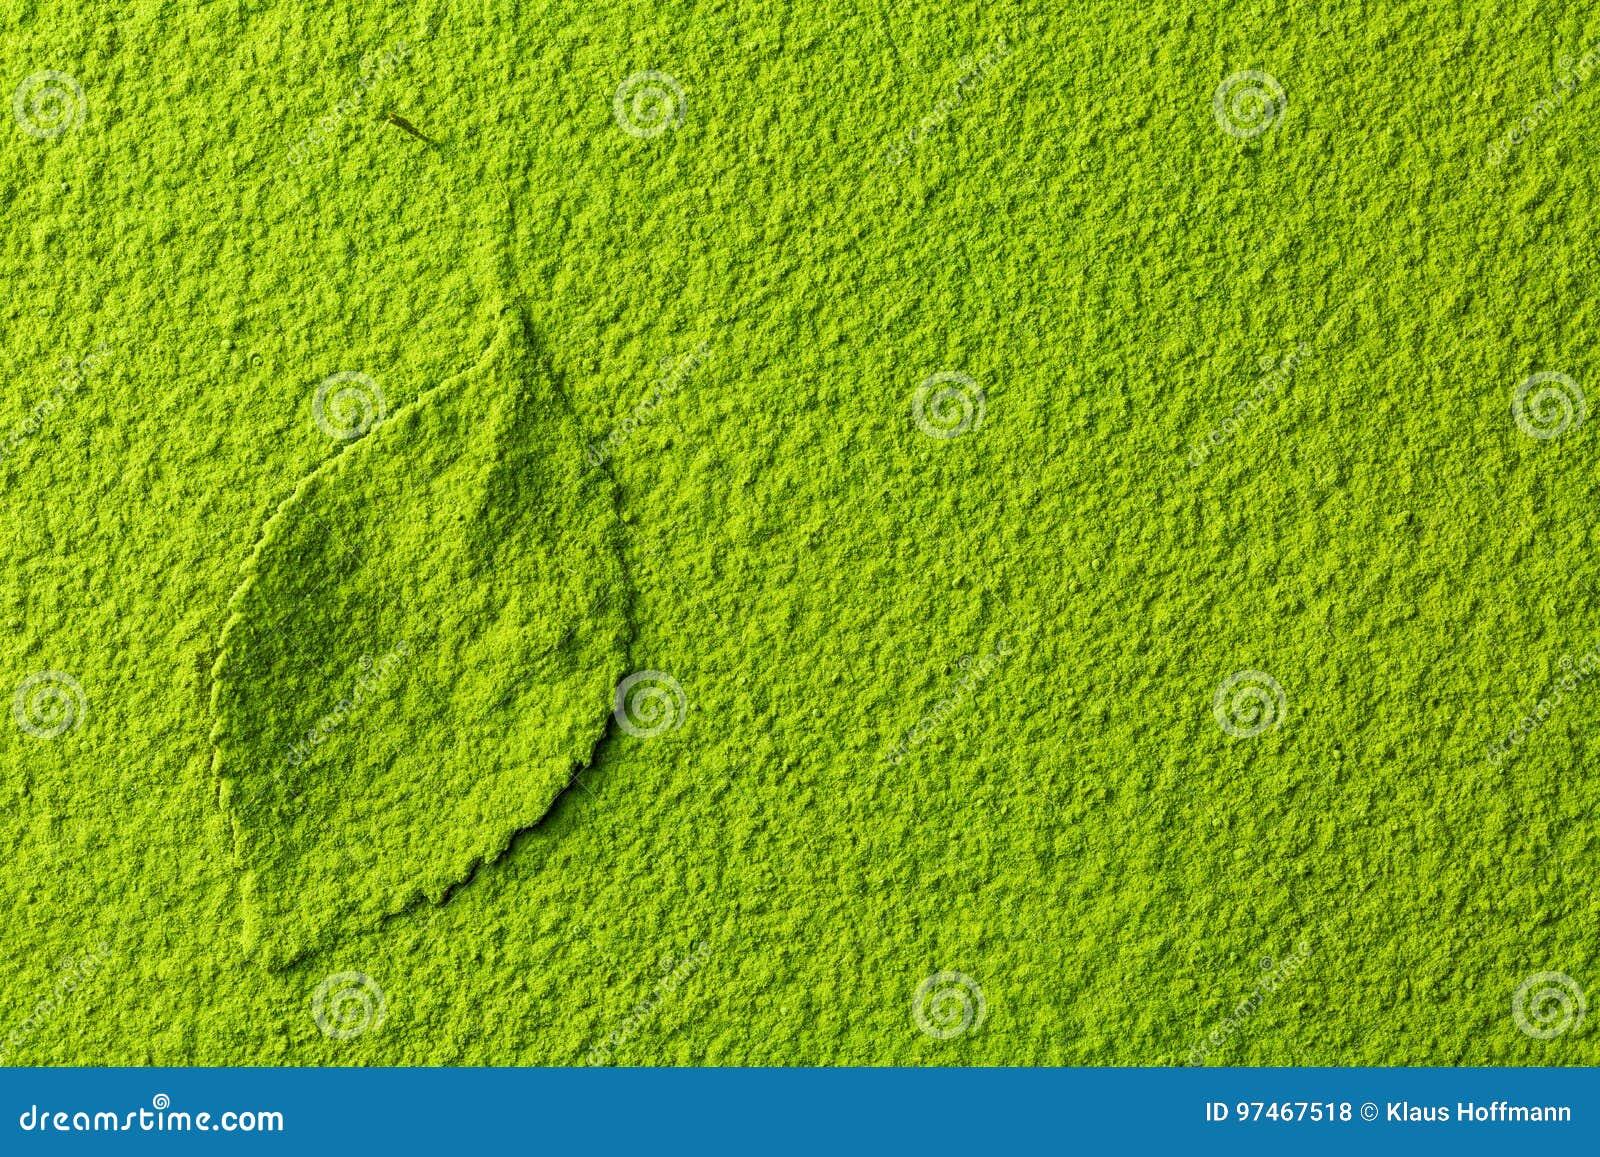 Green matcha tea powder with tea leaf